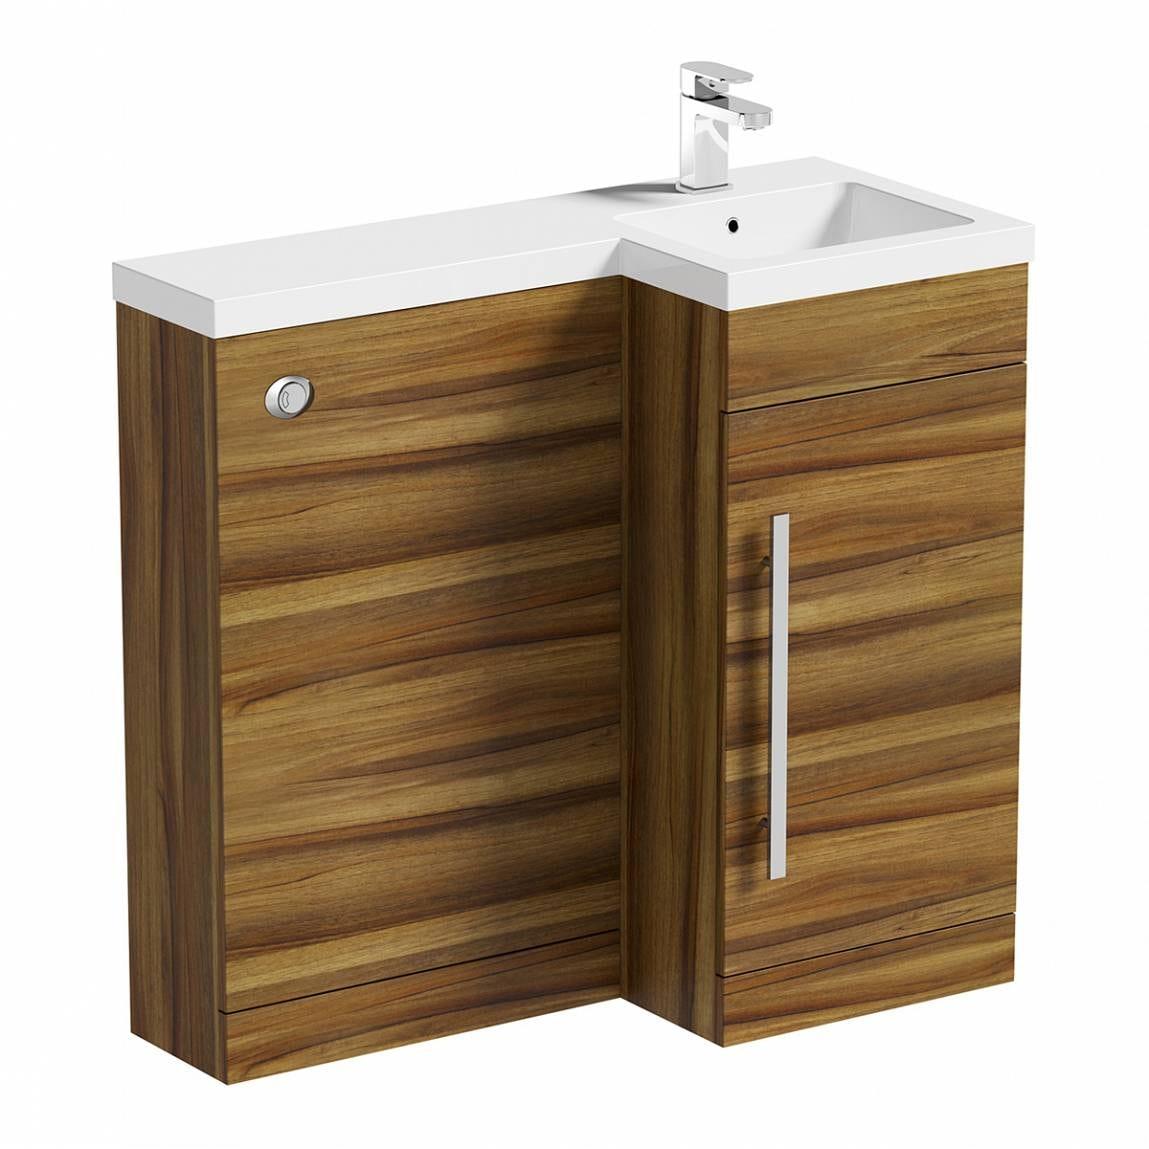 MySpace Walnut Combination Unit RH including Concealed Cistern